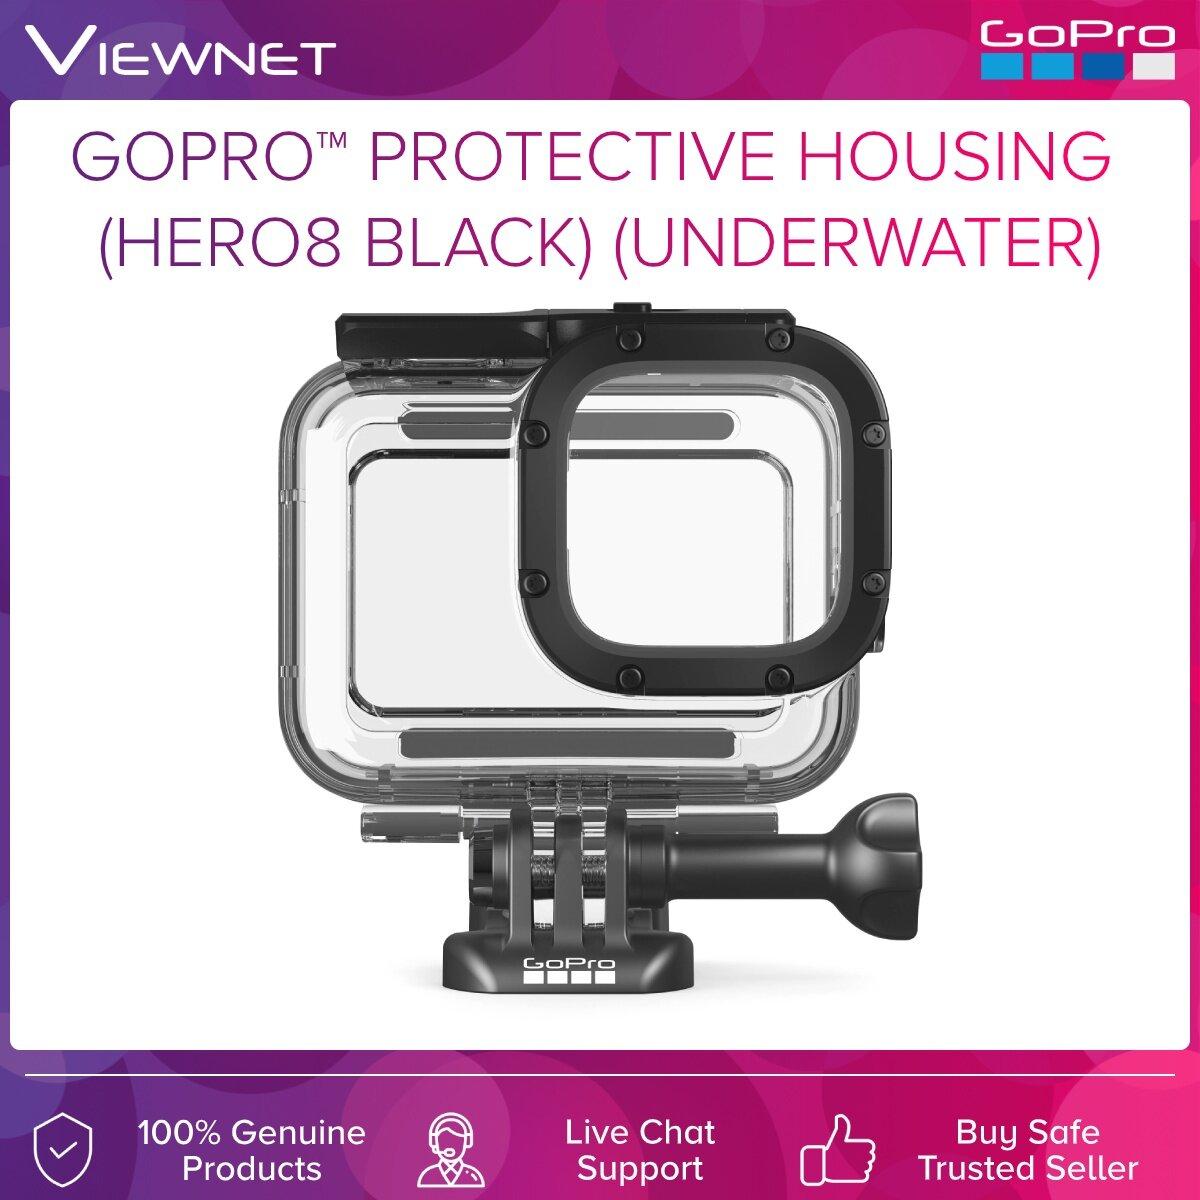 GOPRO PROTECTIVE HOUSING (HERO8 BLACK) (UNDERWATER)